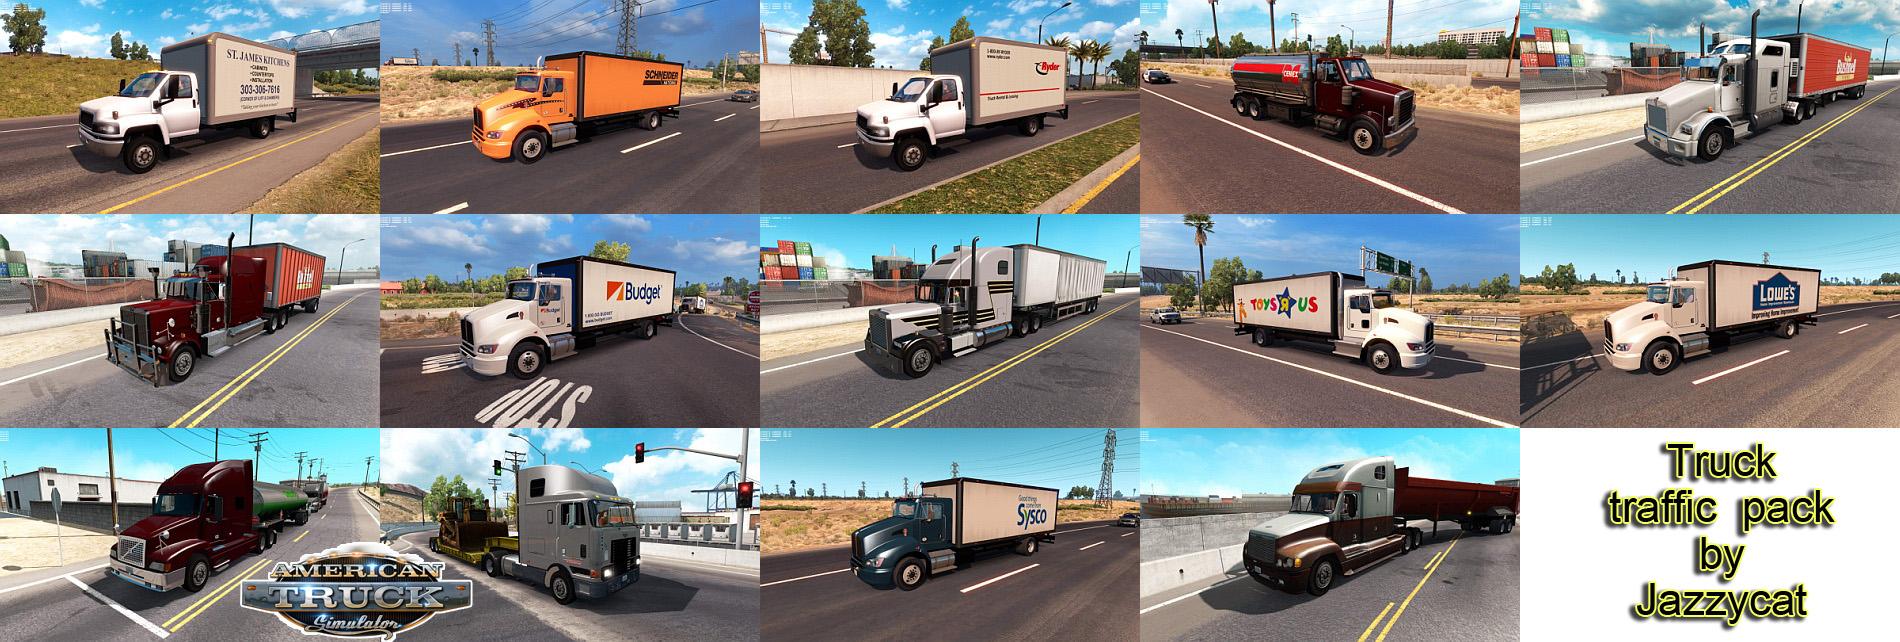 02_truck_traffic_pack_by_Jazzycat_v1.2.jpg